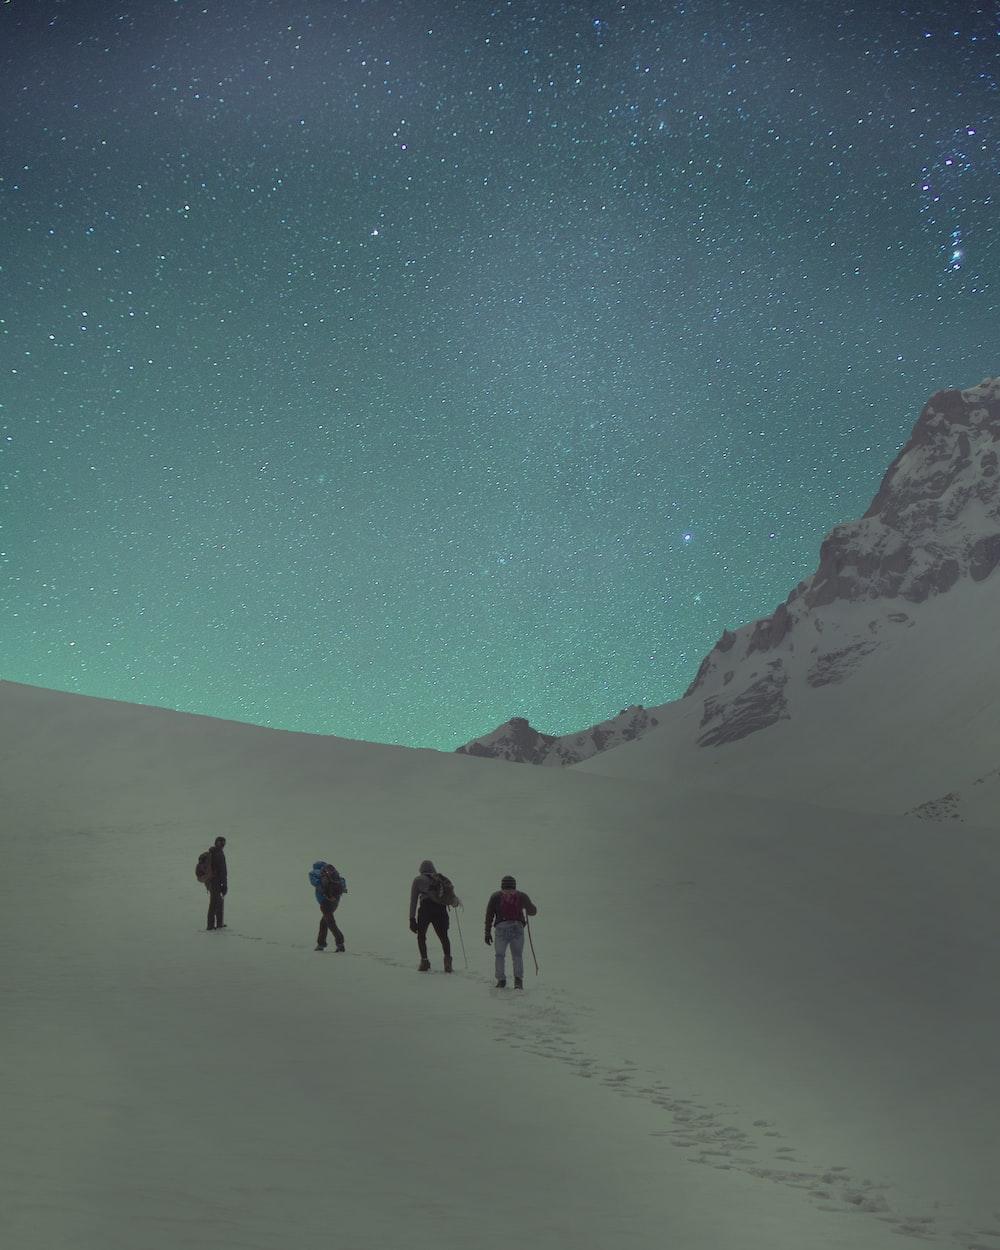 four people walking near mountain